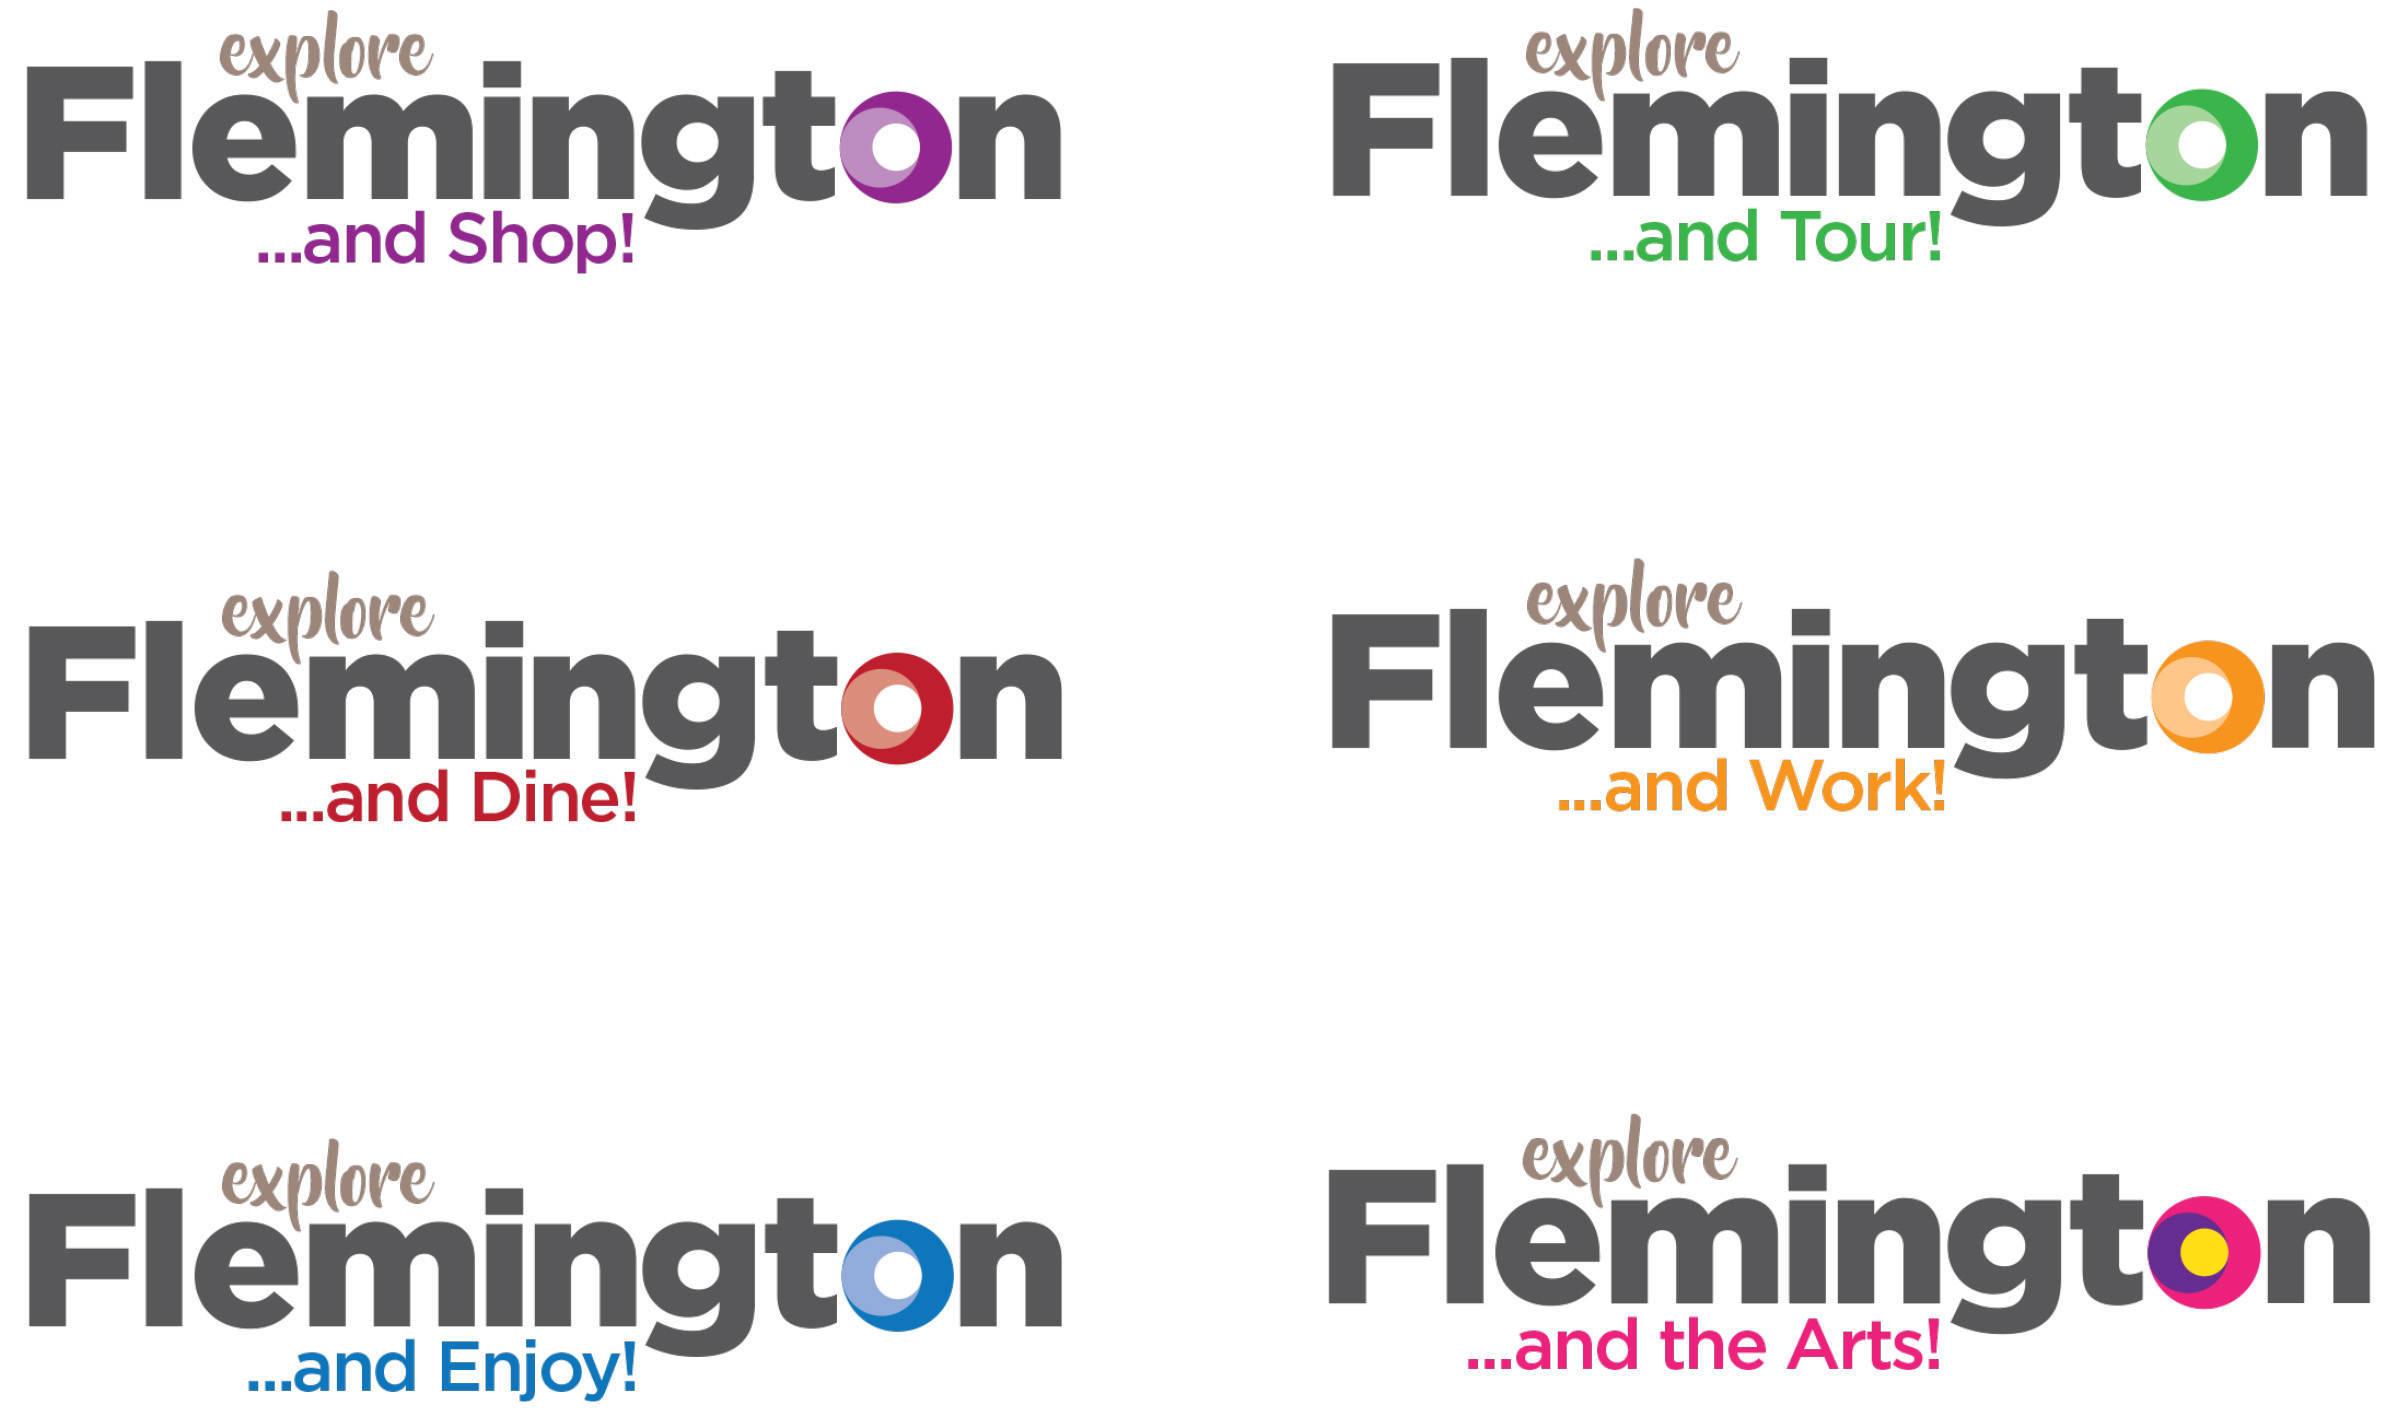 c92d4e97dbca1d41b9a3_explore_Flemington_logos.jpg